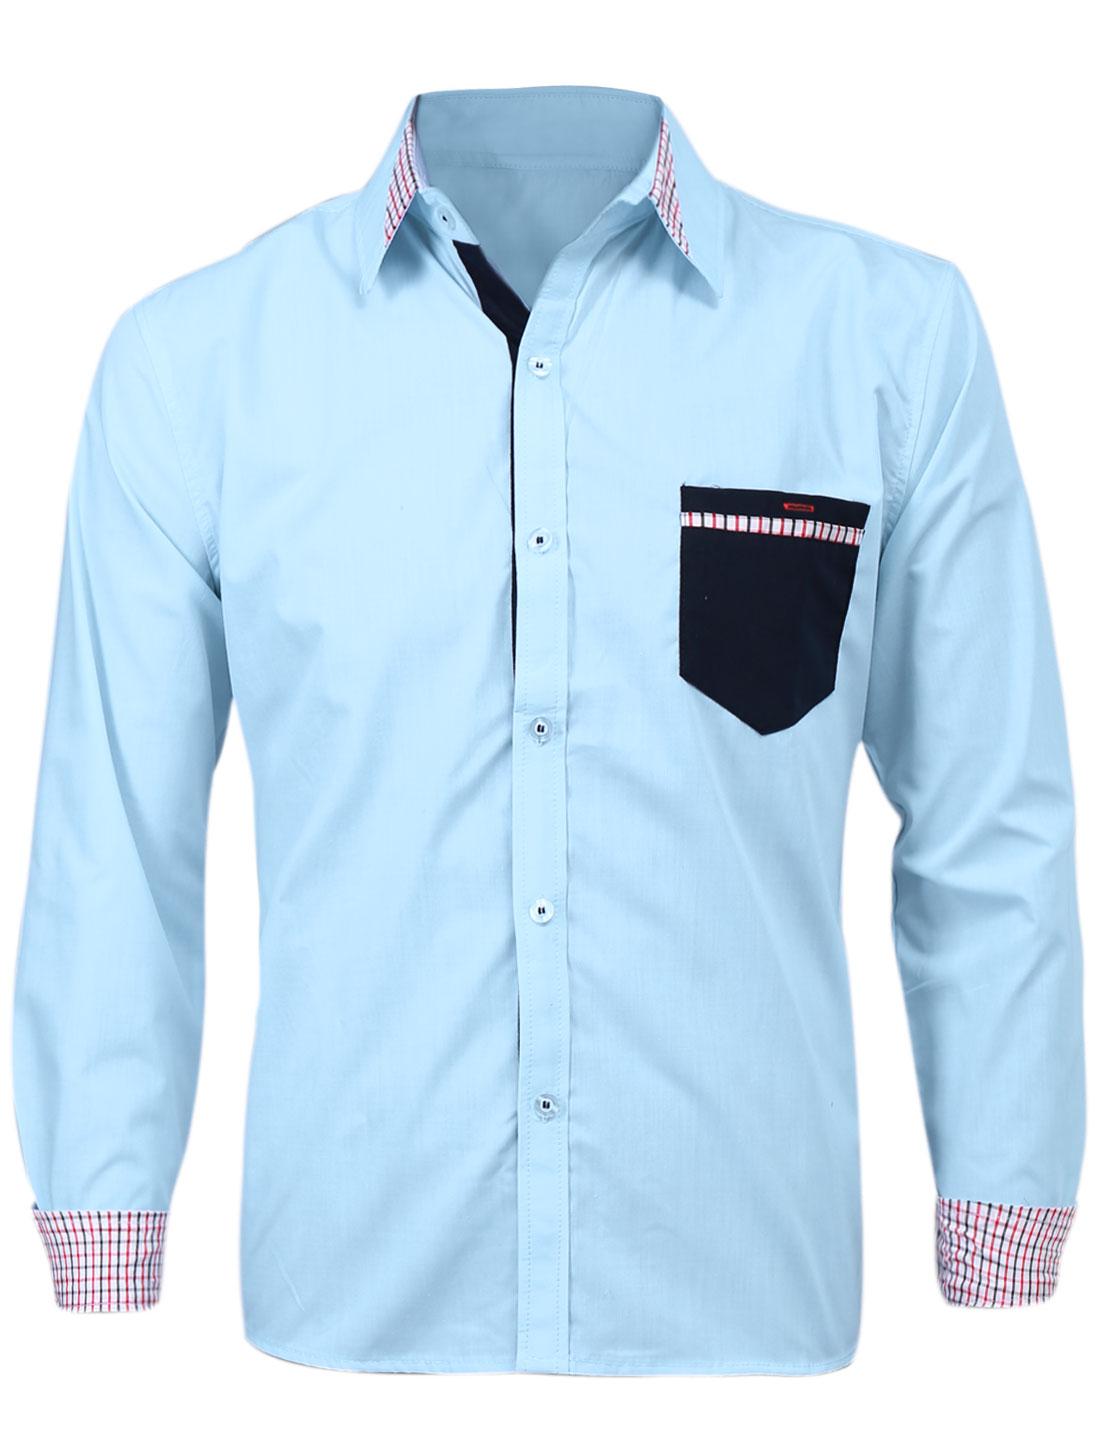 Men Point Collar Plaids Detail Button Front Casual Shirt Sky Blue M